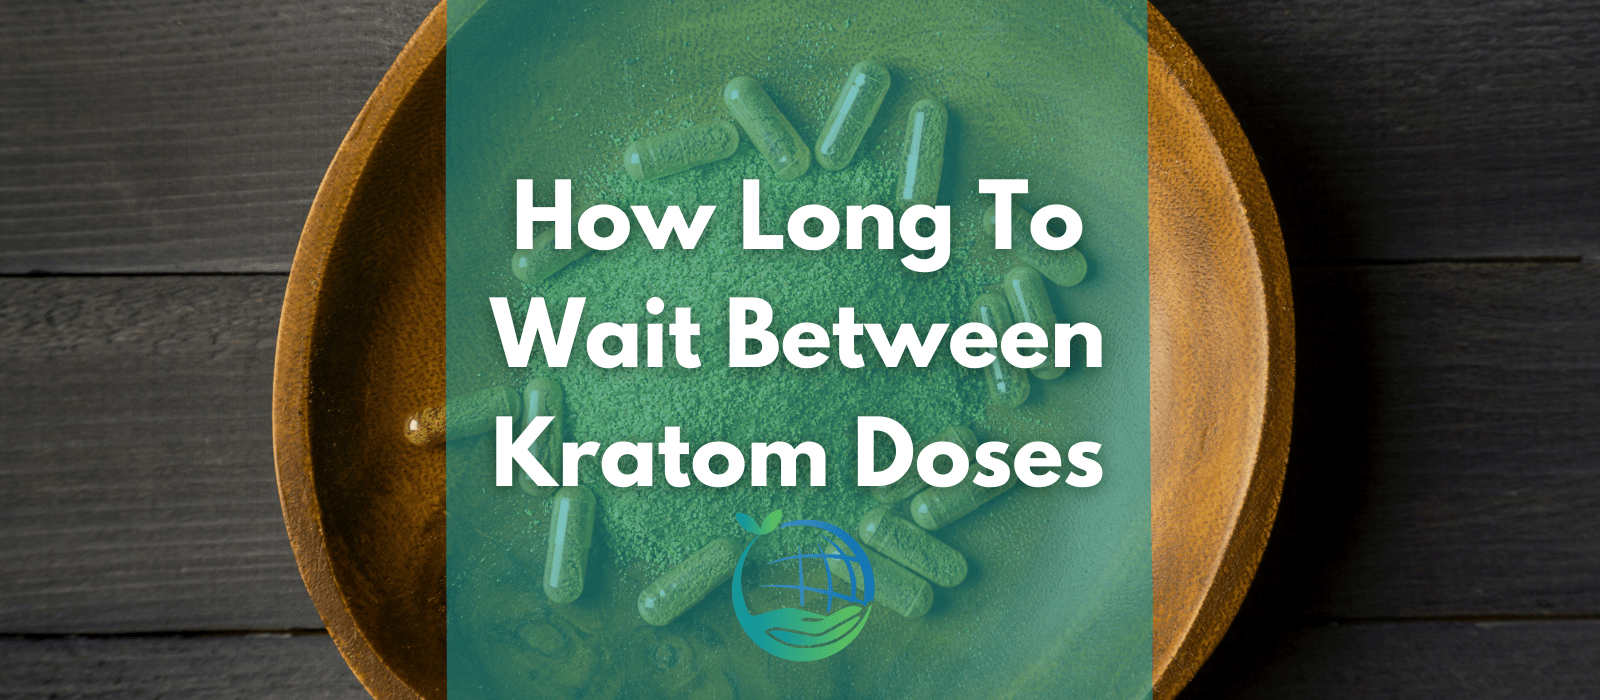 How Long To Wait Between Kratom Doses